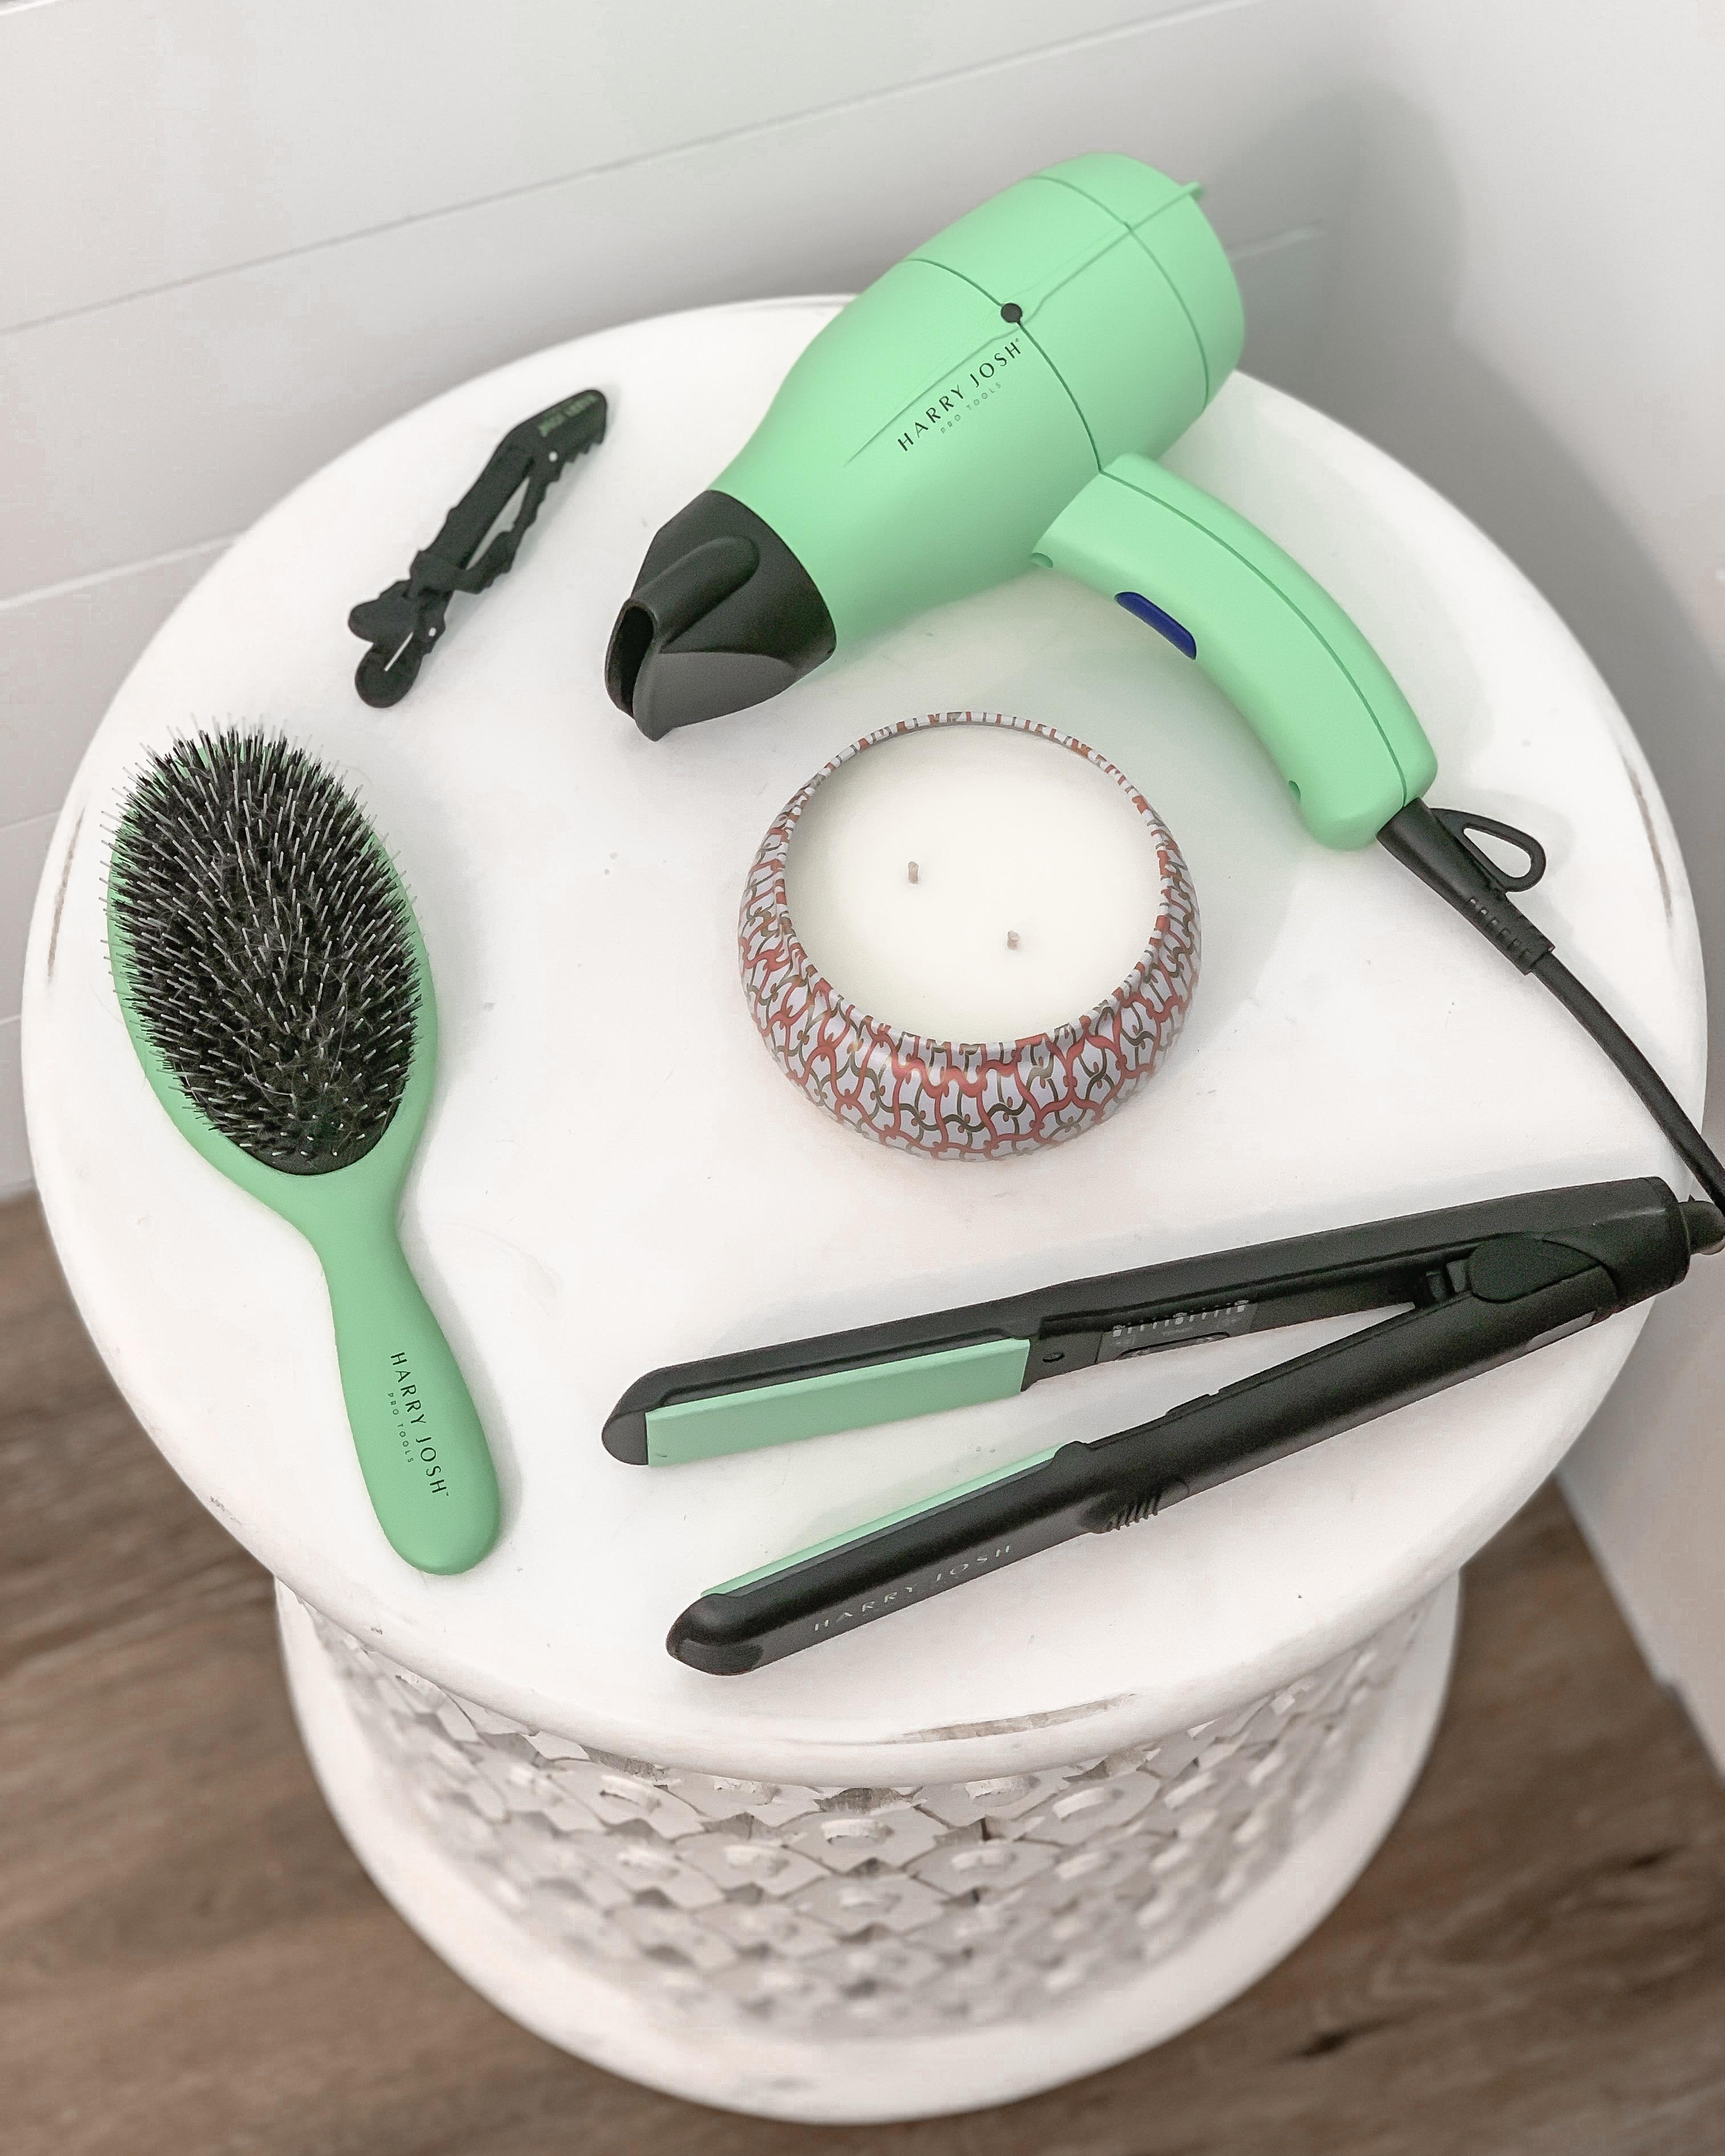 curling hair with straightener harry josh short hairstyle laura beverlin